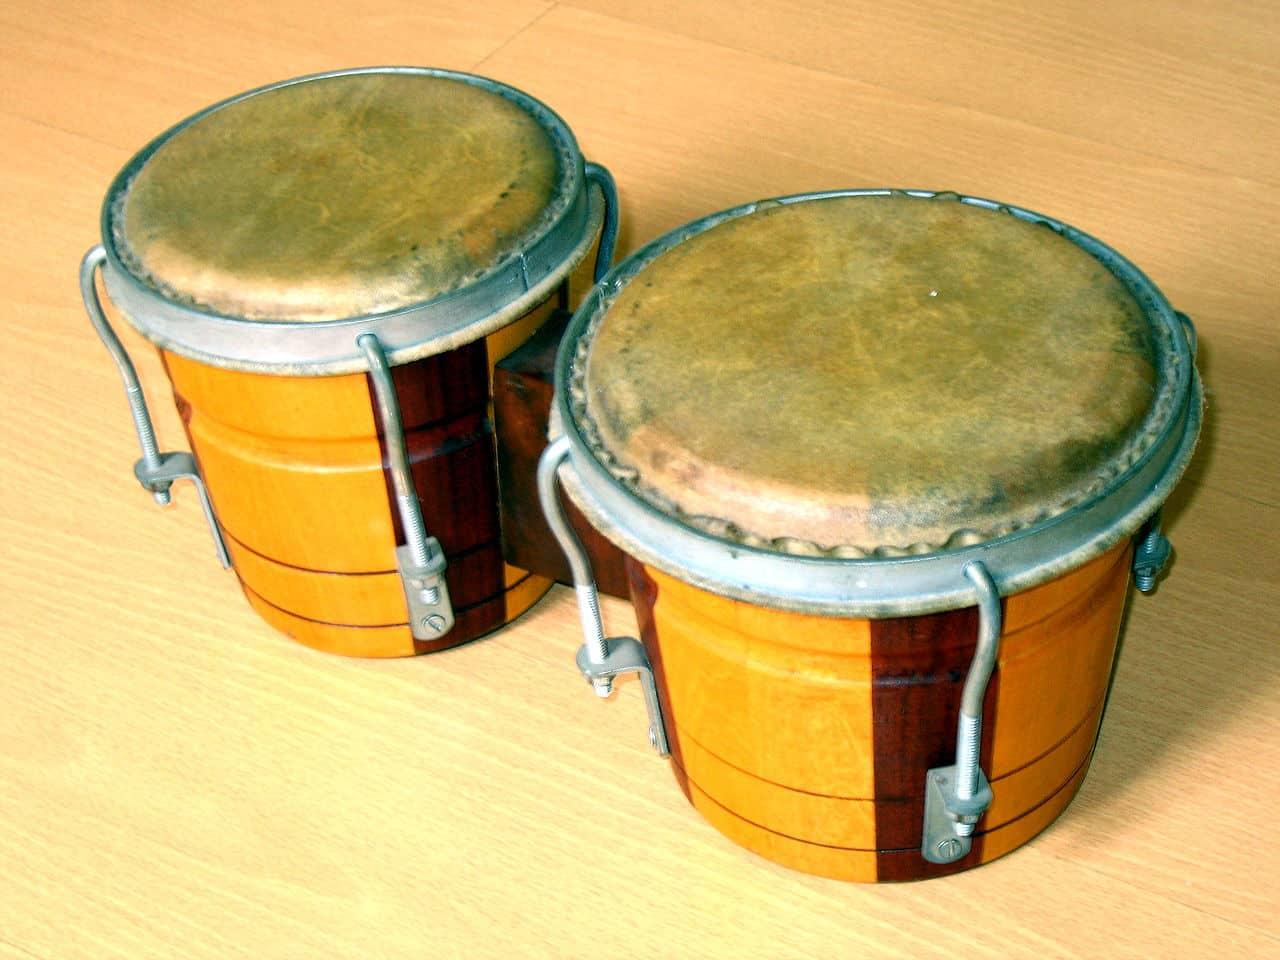 bongo's - bongo - bongos - bongó